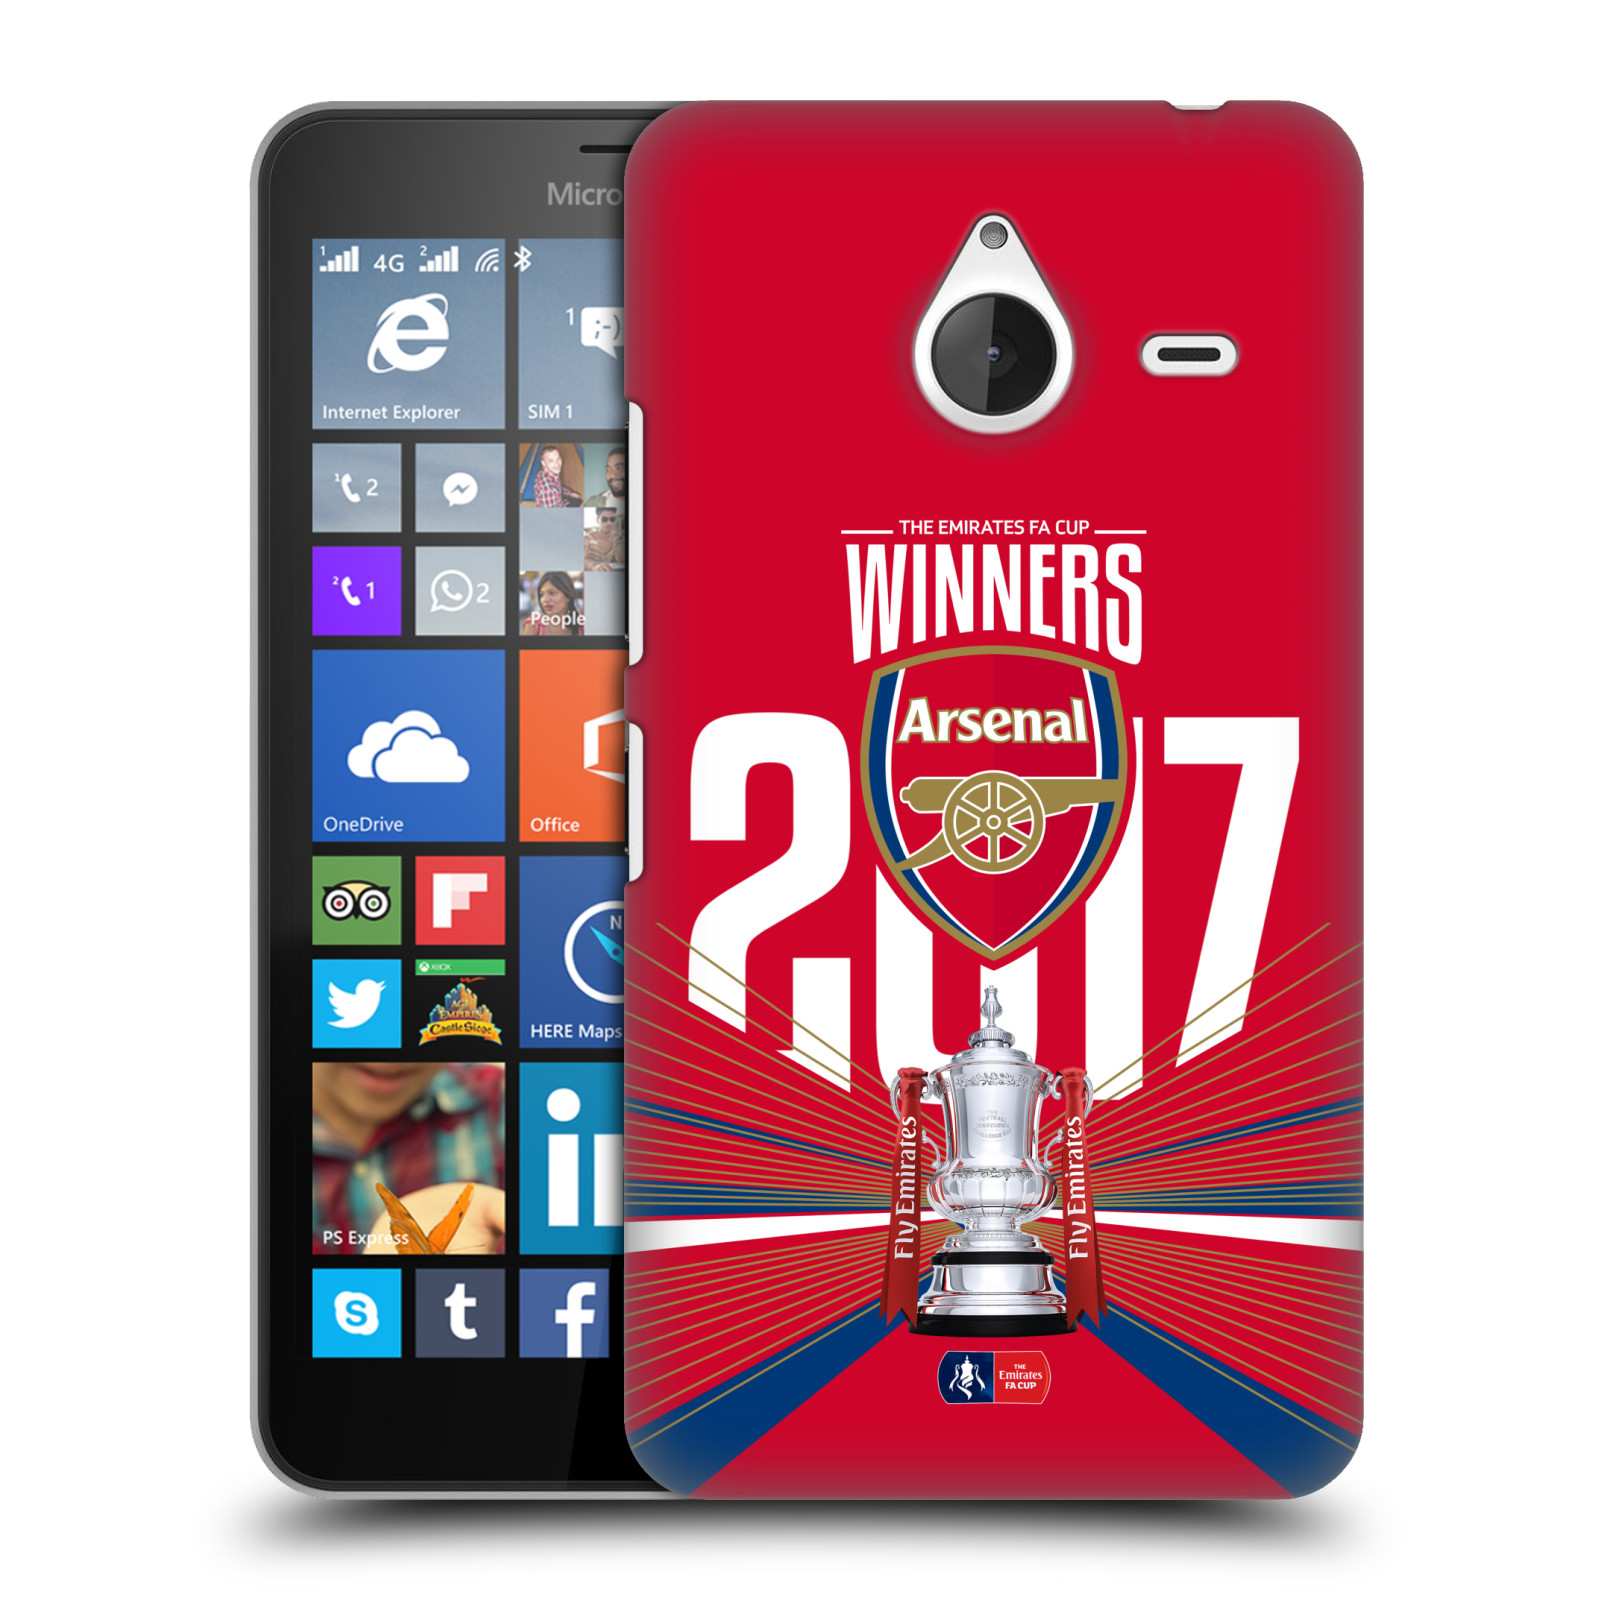 Plastové pouzdro na mobil Microsoft Lumia 640 XL - Head Case - Arsenal FC - Trophy